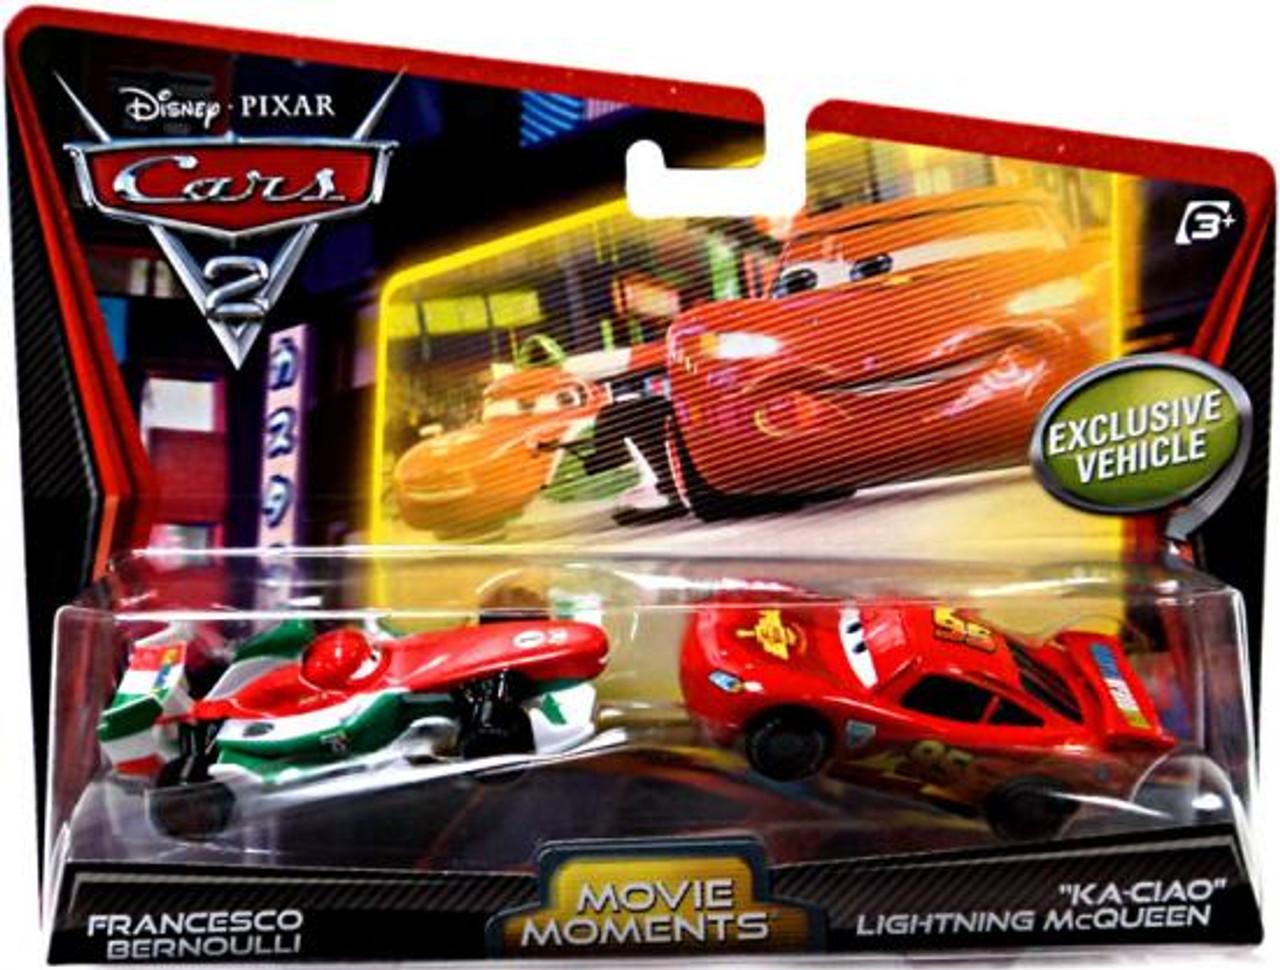 Disney Cars Cars 2 Francesco Bernoulli & Ka-Ciao Lightning McQueen Diecast Car 2-Pack